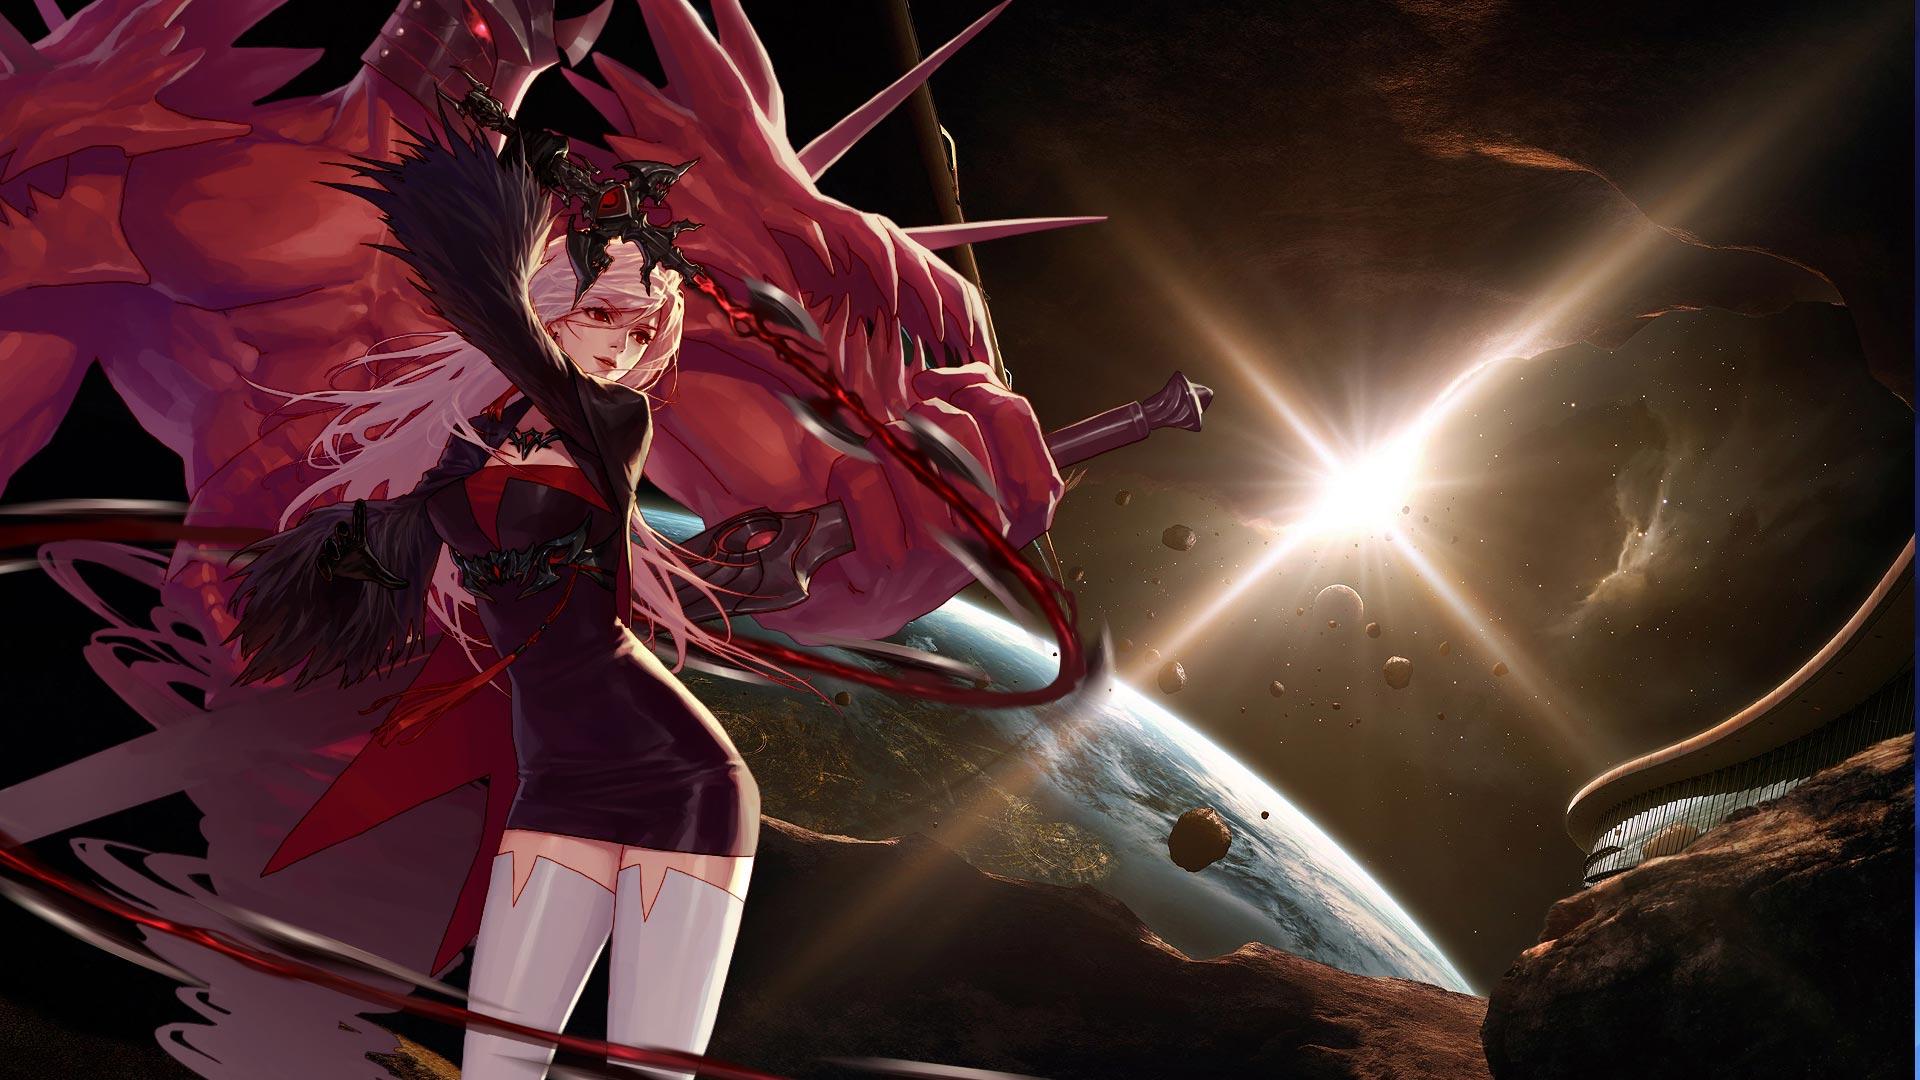 DNF玩家自制女鬼剑士霸气性感超清壁纸下载